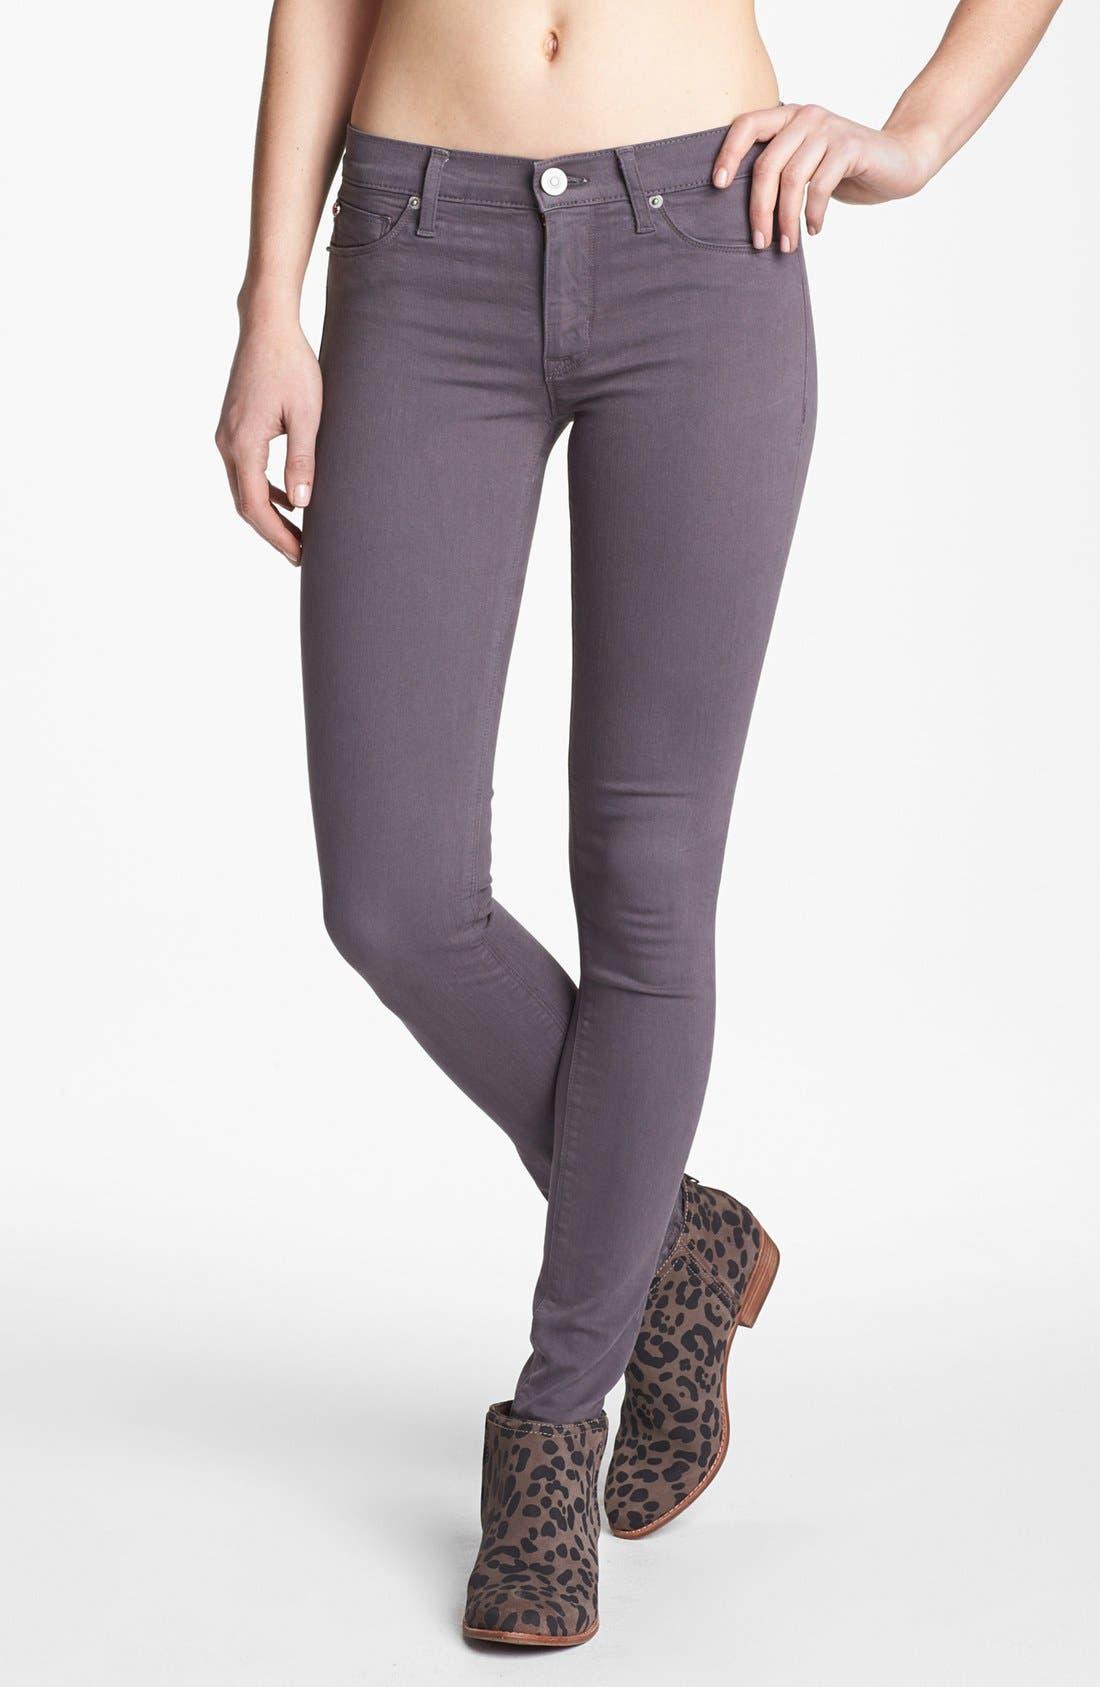 Main Image - Hudson Jeans 'Colette' Mid Rise Skinny Jeans (Steel Grey)